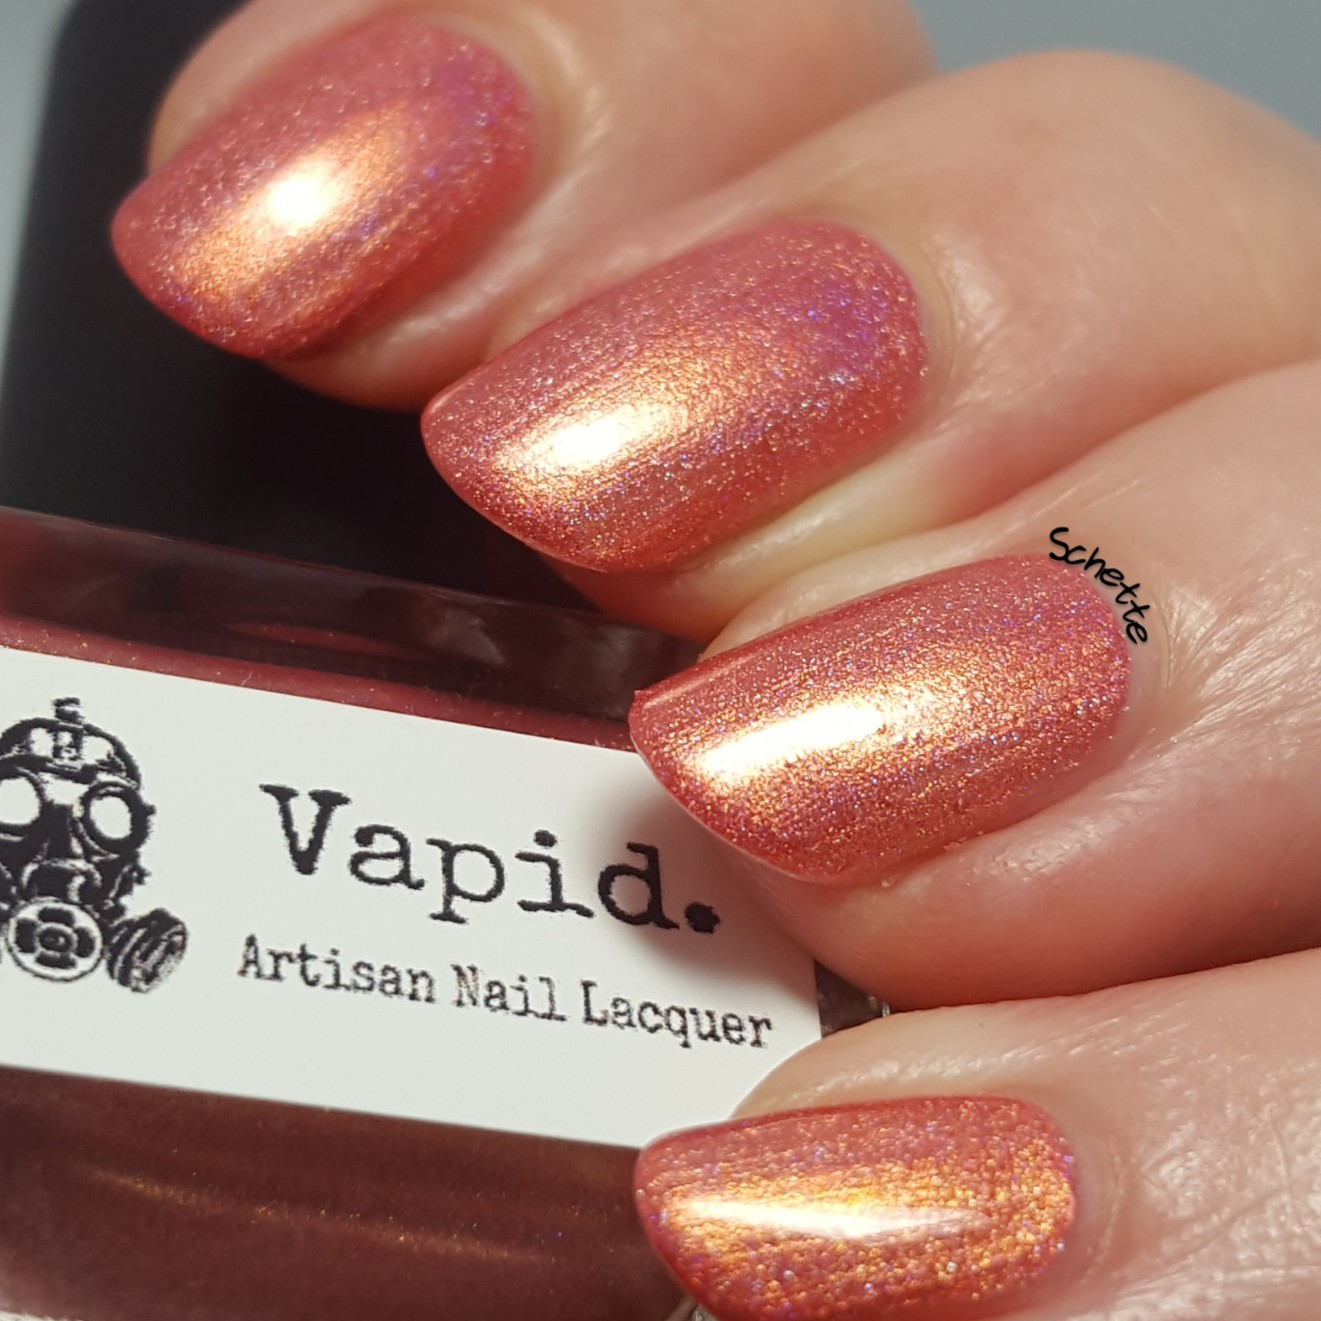 Vapid Lacquer - Dragon Tears